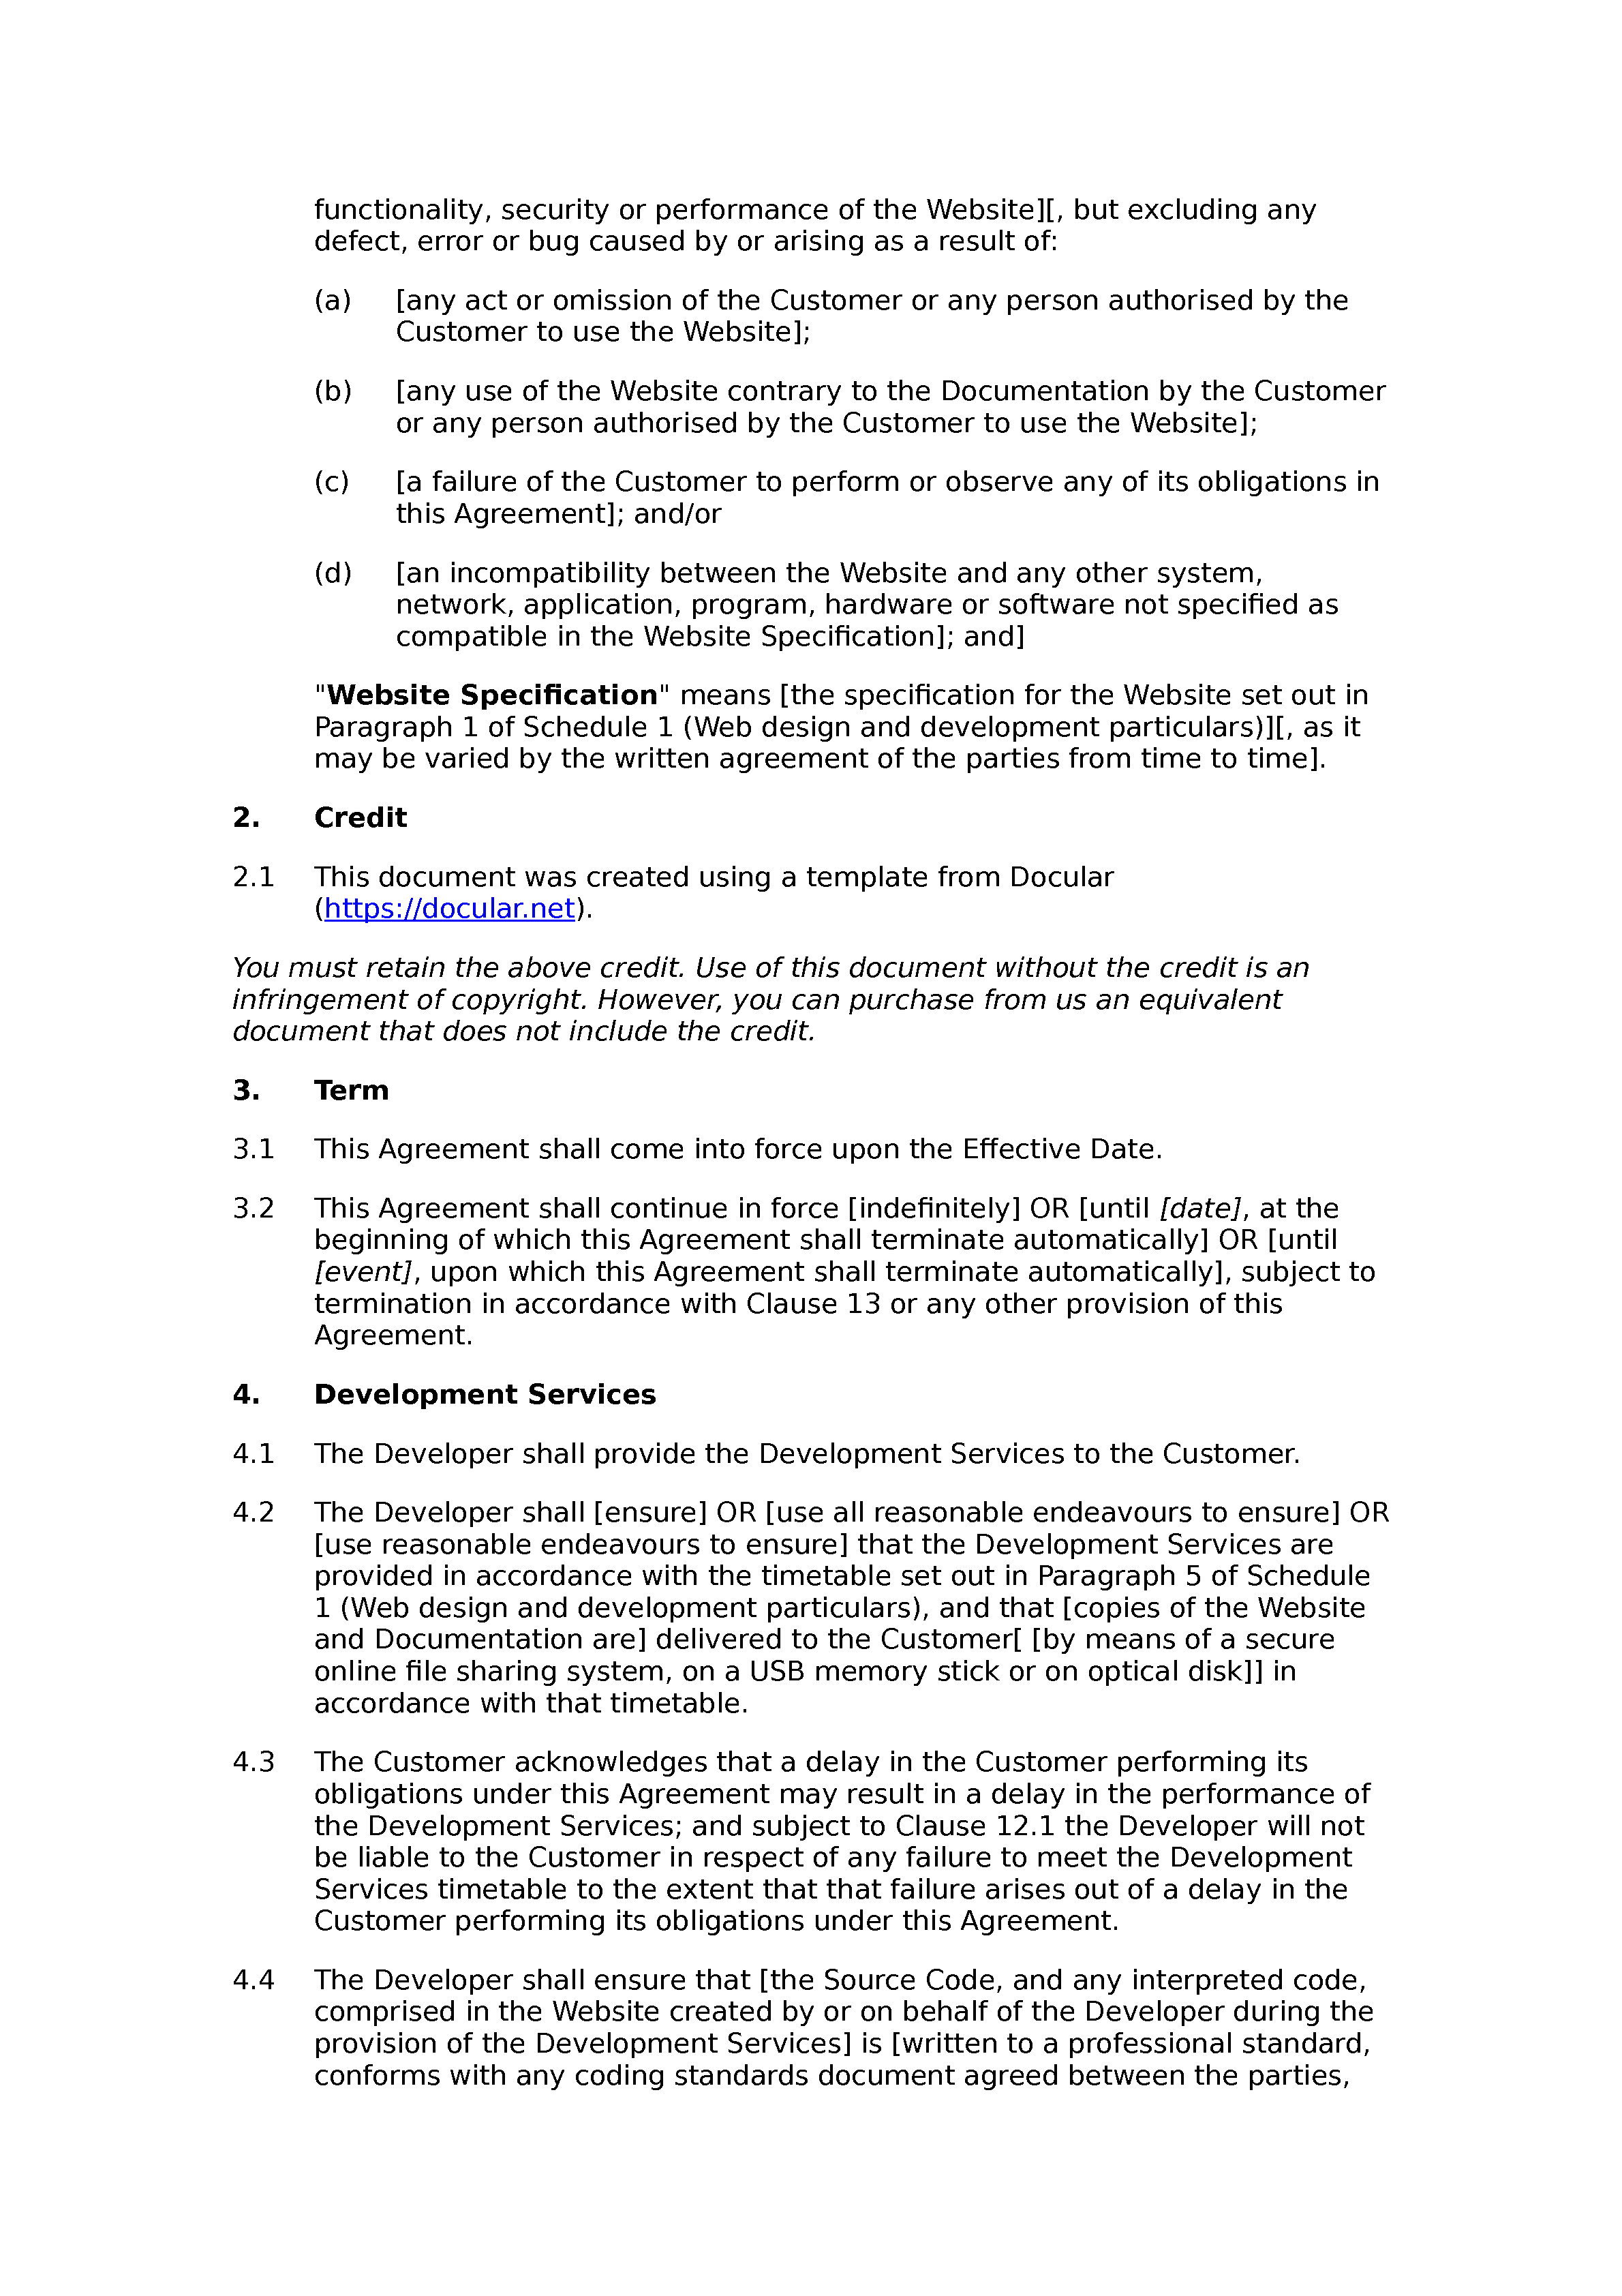 Free web design and development agreement Docular – Website Development Agreement